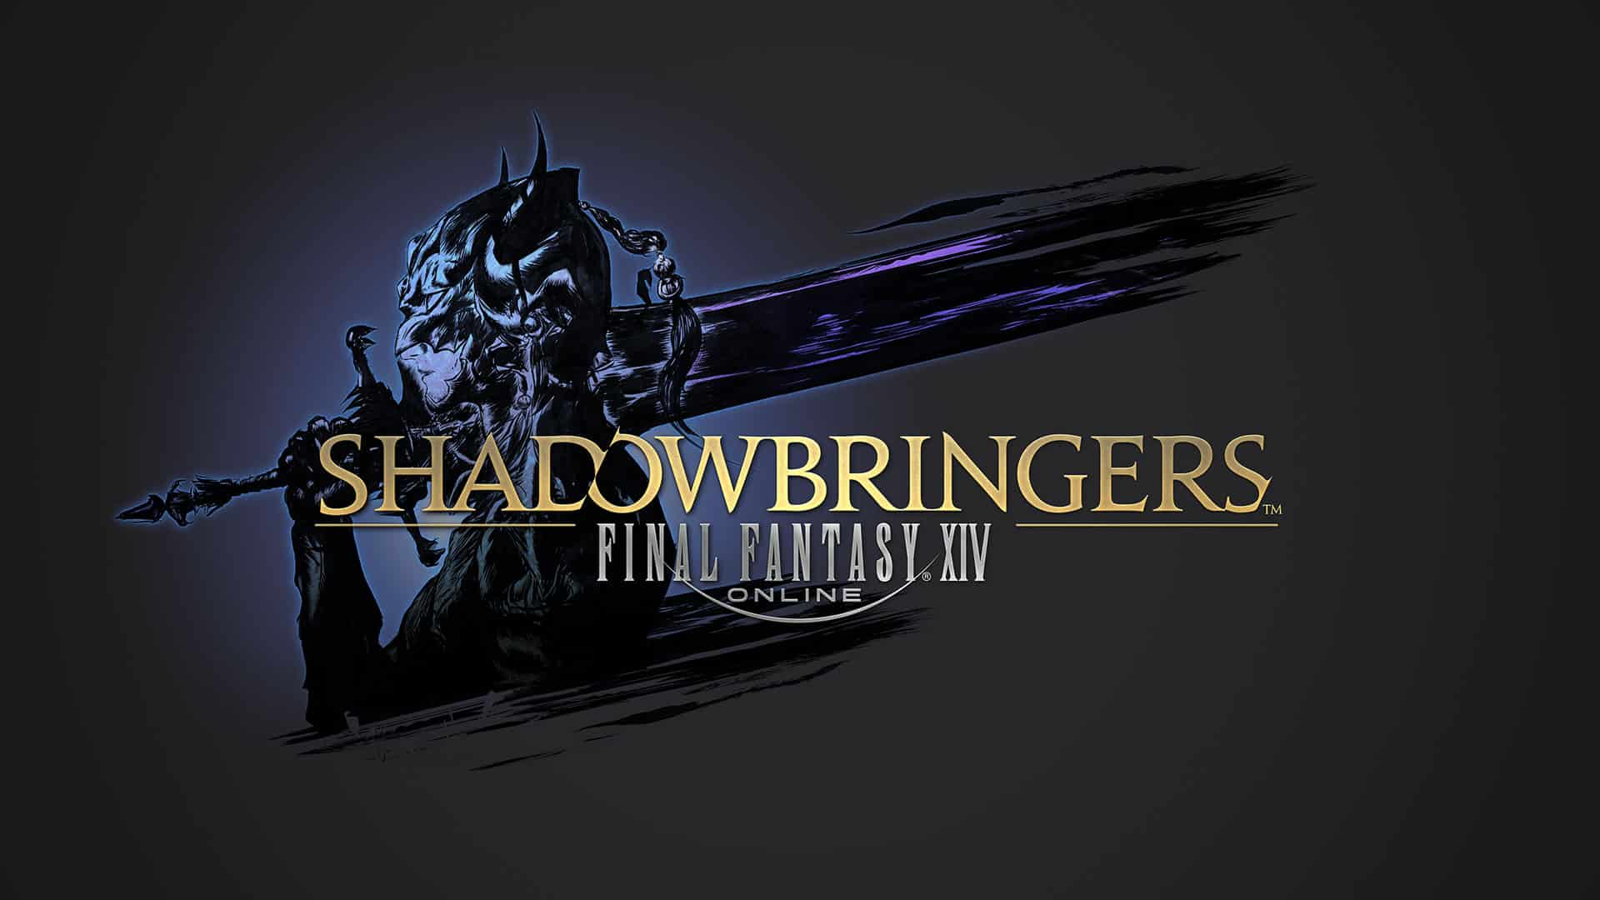 Final Fantasy XIV: Shadowbringers Expansion Coming Summer 2019 5